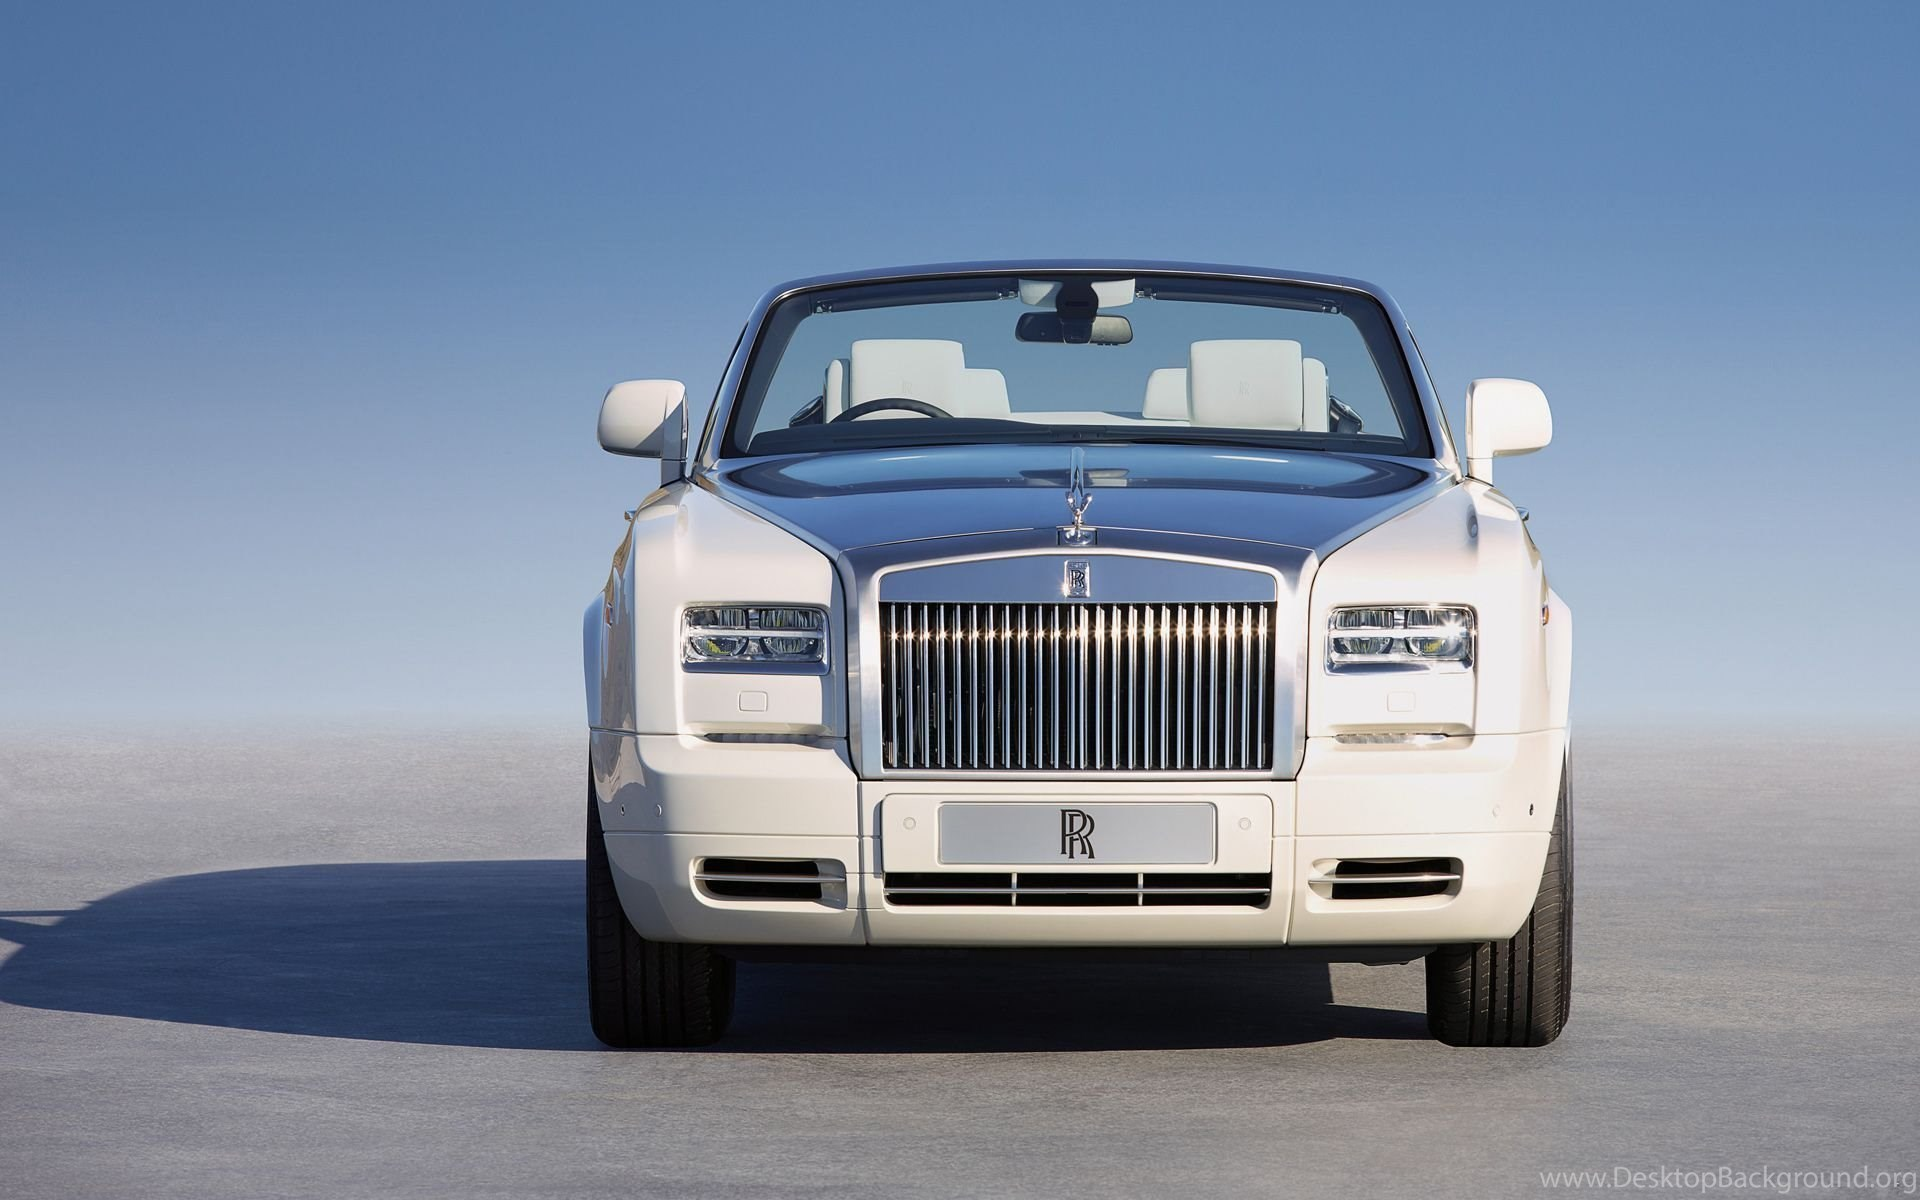 135 Rolls Royce Hd Wallpapers Desktop Background